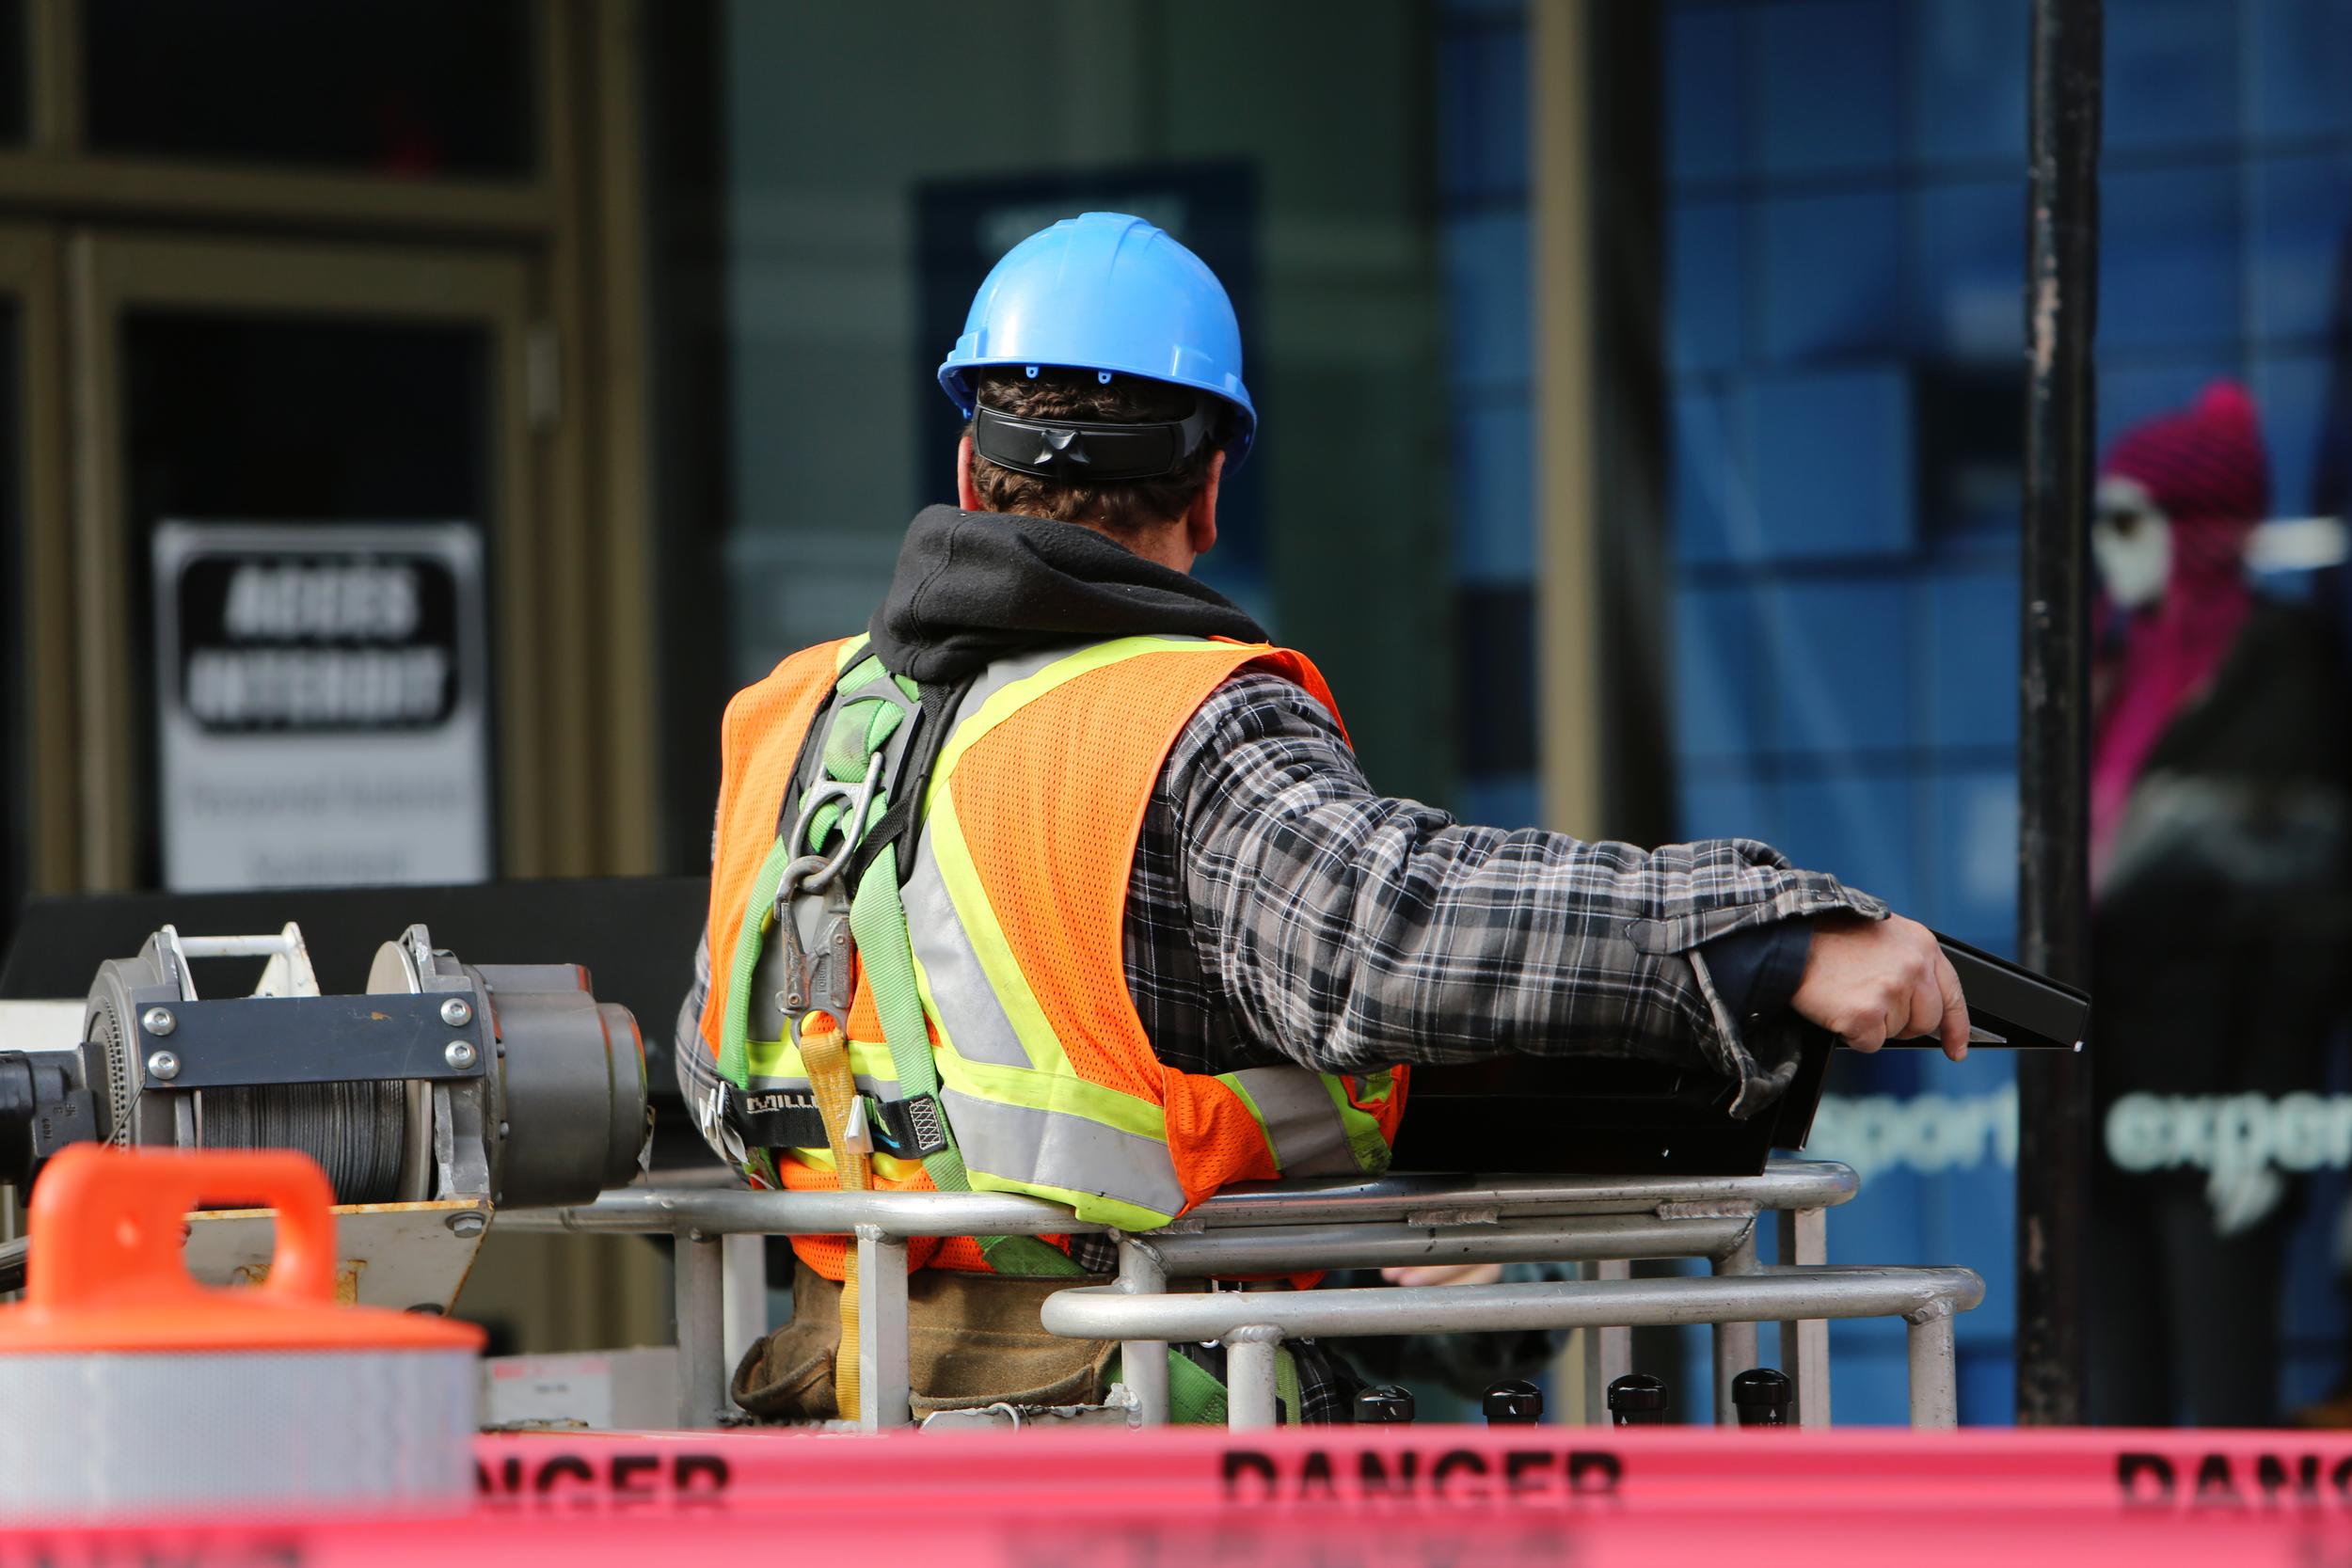 Metro Detroit Workers' Compensation Attorney